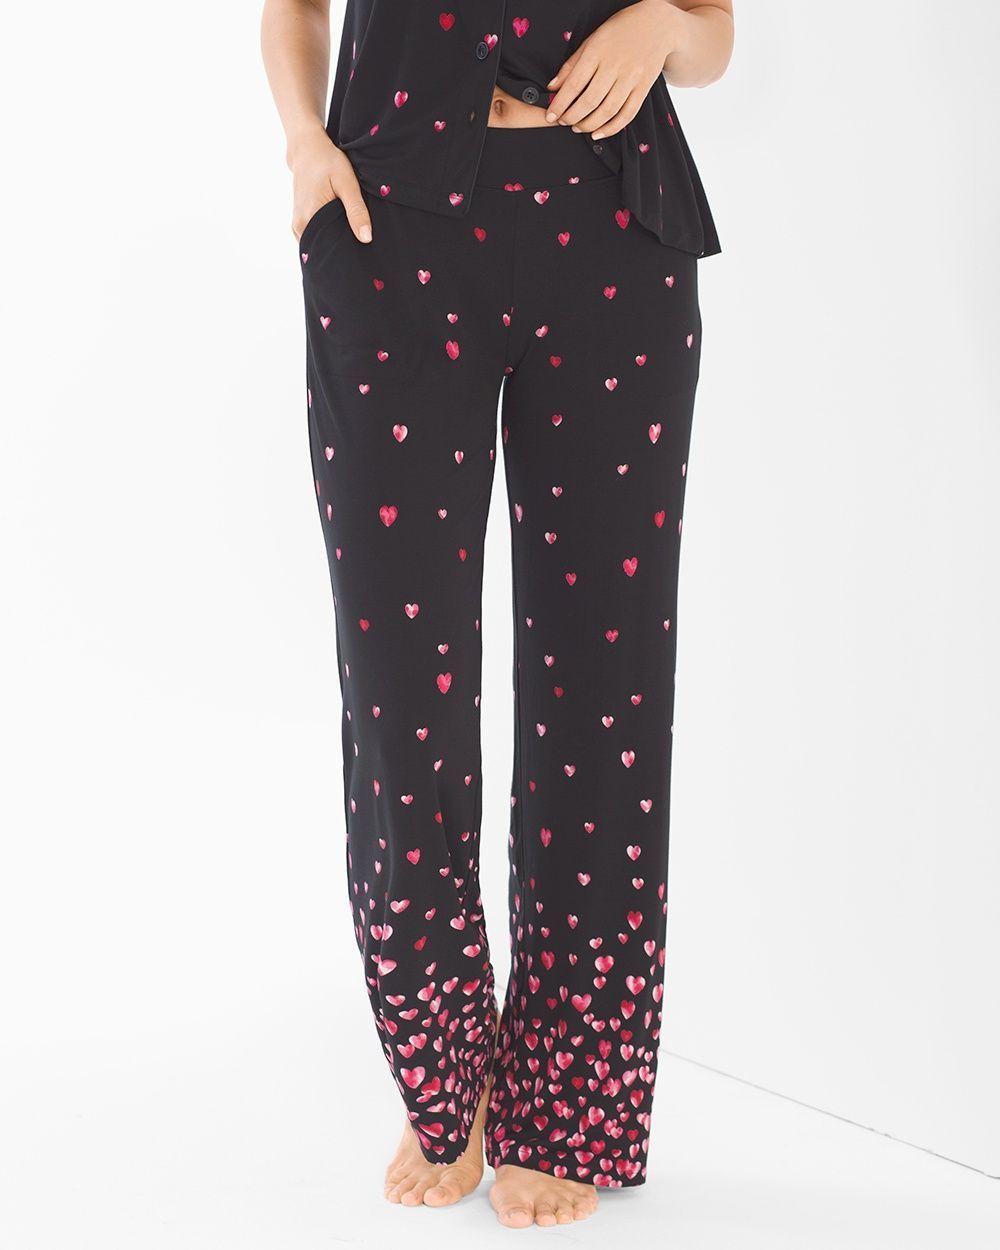 Soma Cool Nights Pajama Pants Floating Hearts Border Black 2ef5ed4e4